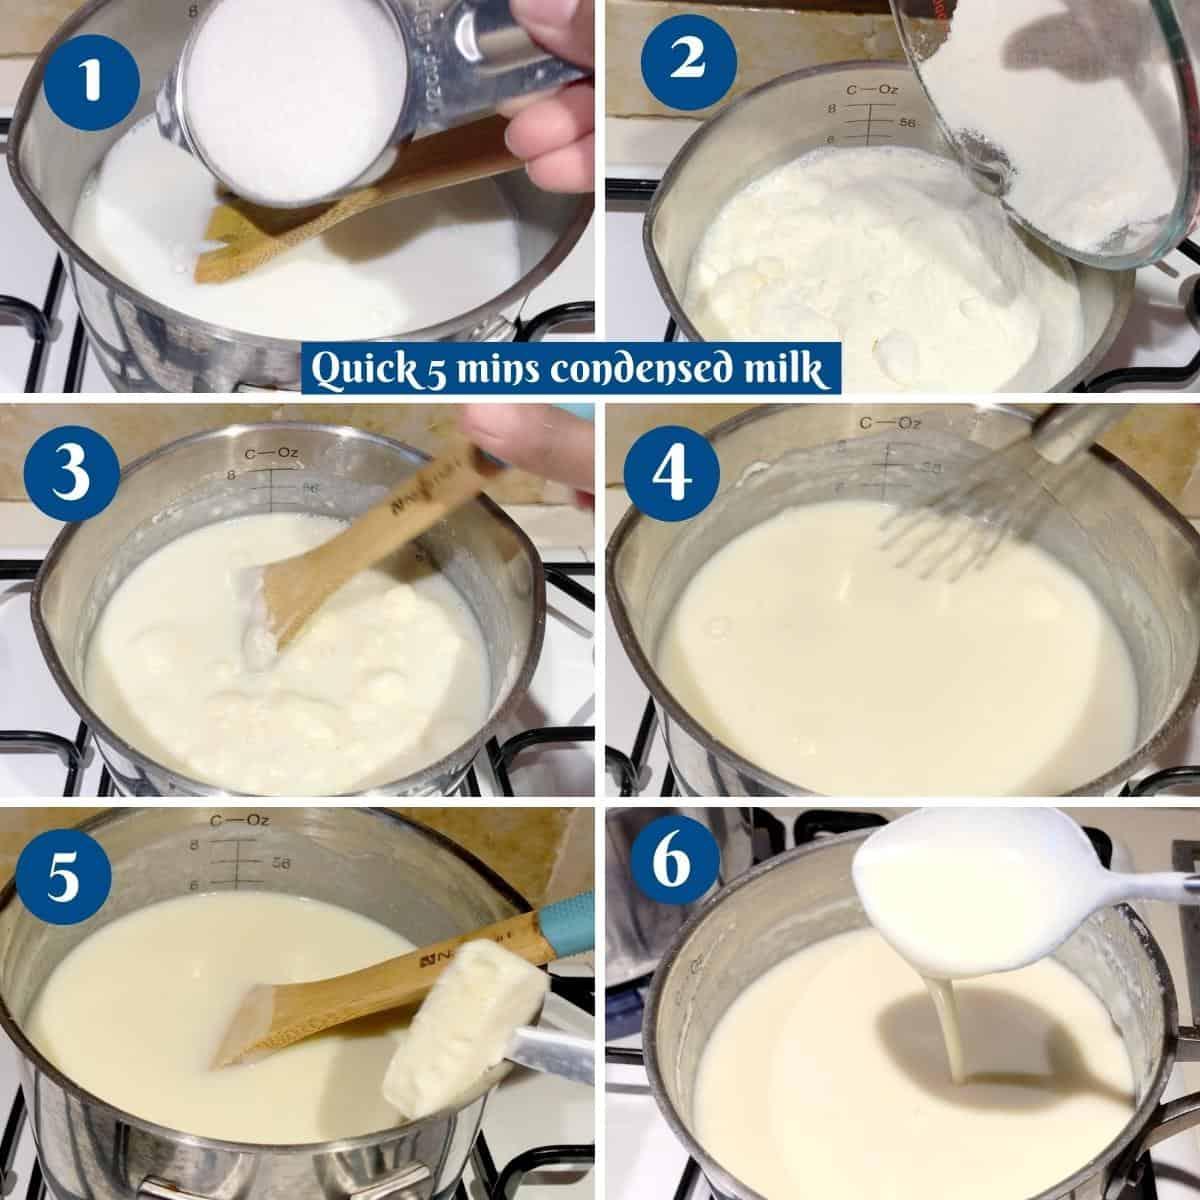 Progress pictures collage for quick condensed milk.